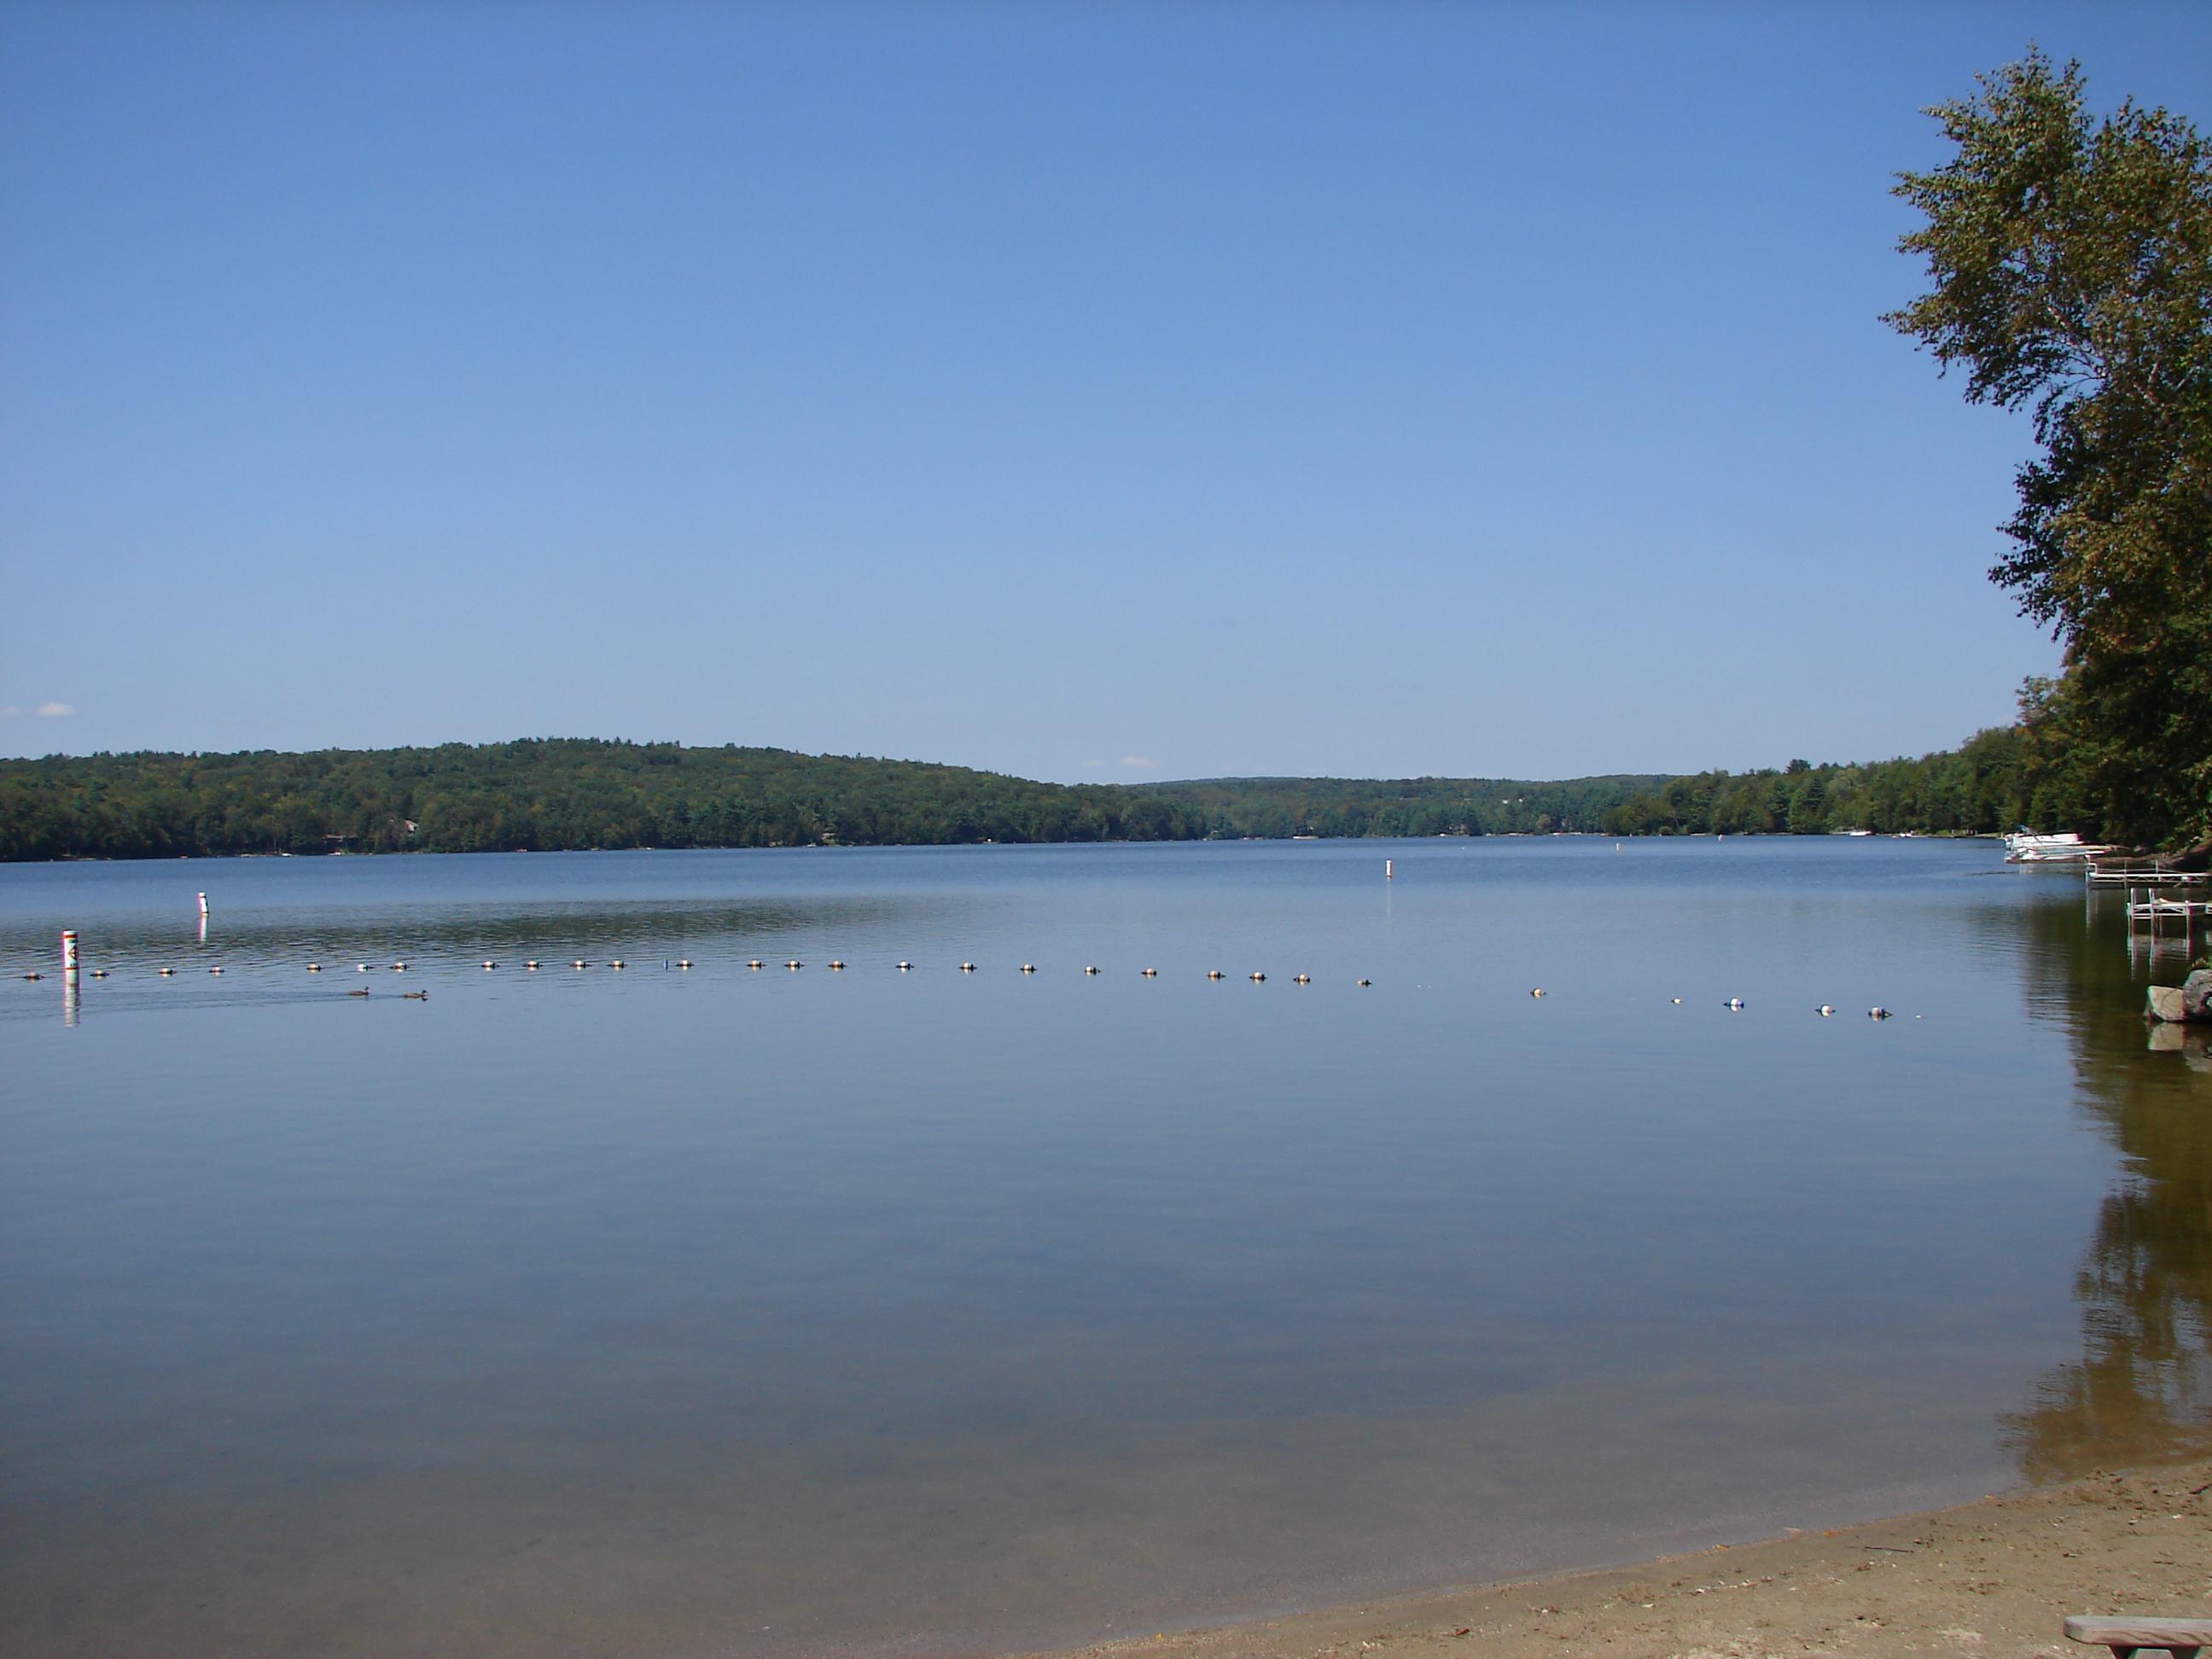 Land for Sale at Membership Lot at Woodridge Lake East Hyerdale Dr Goshen, Connecticut, 06756 United States